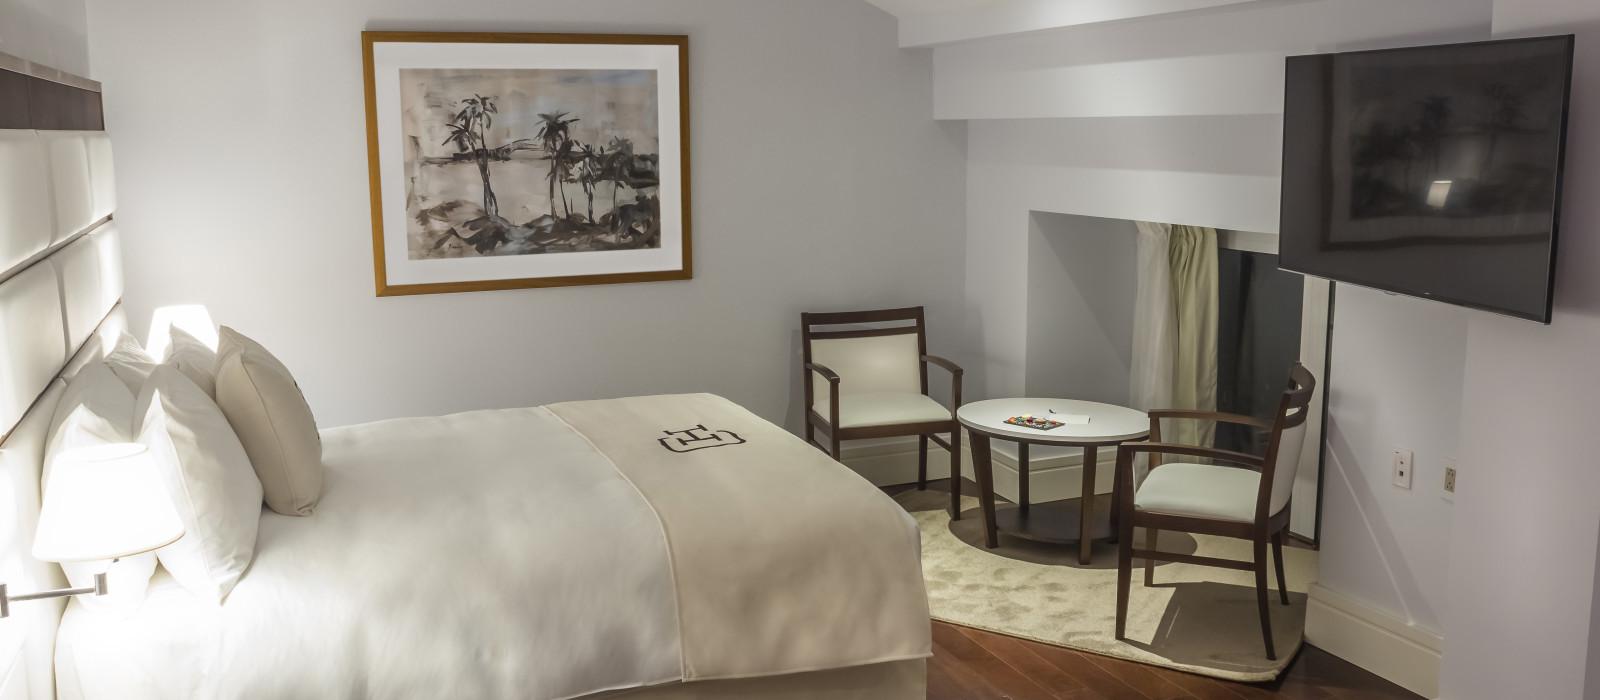 Hotel Central  Panama Panama